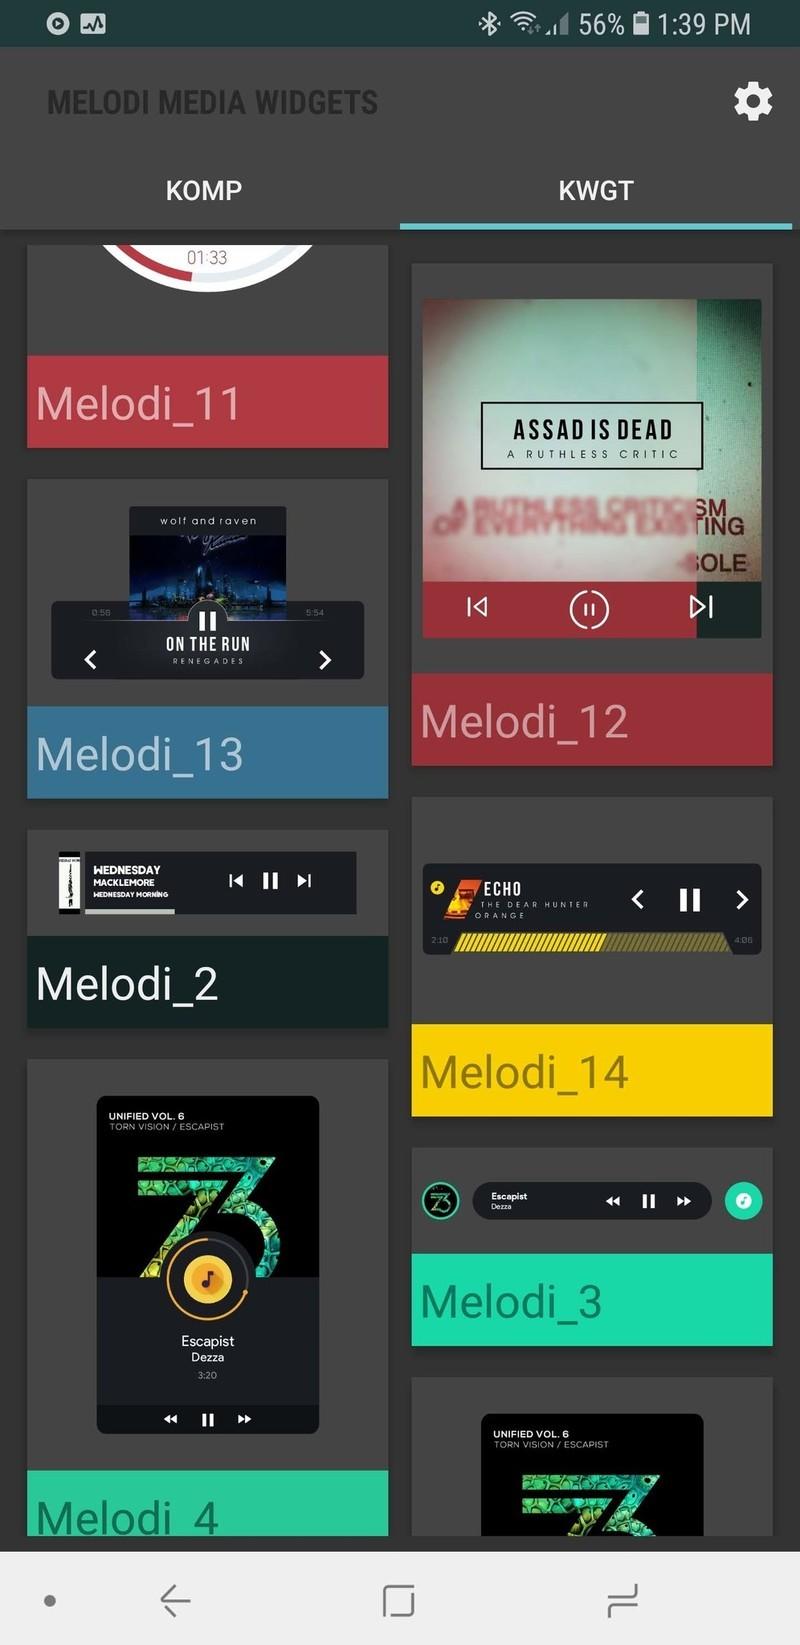 melodi-kustom-music-widget-gallery-s9plu